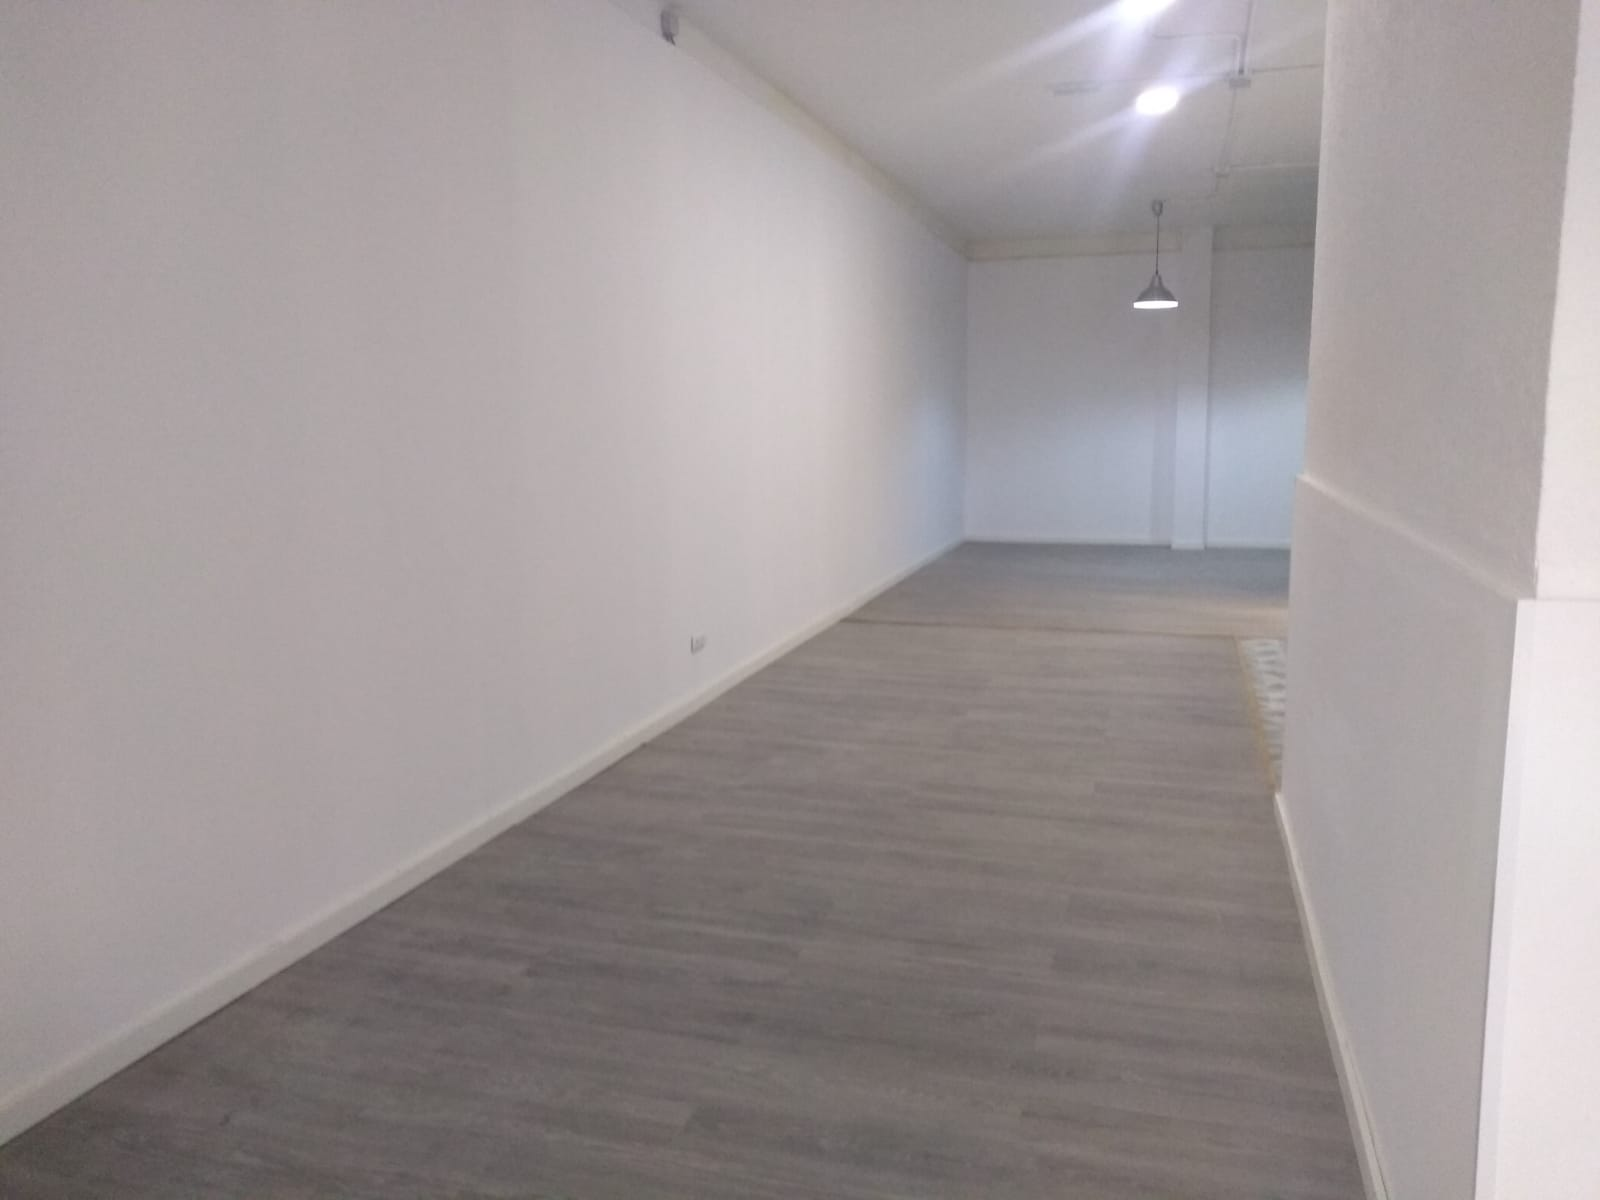 Local en Collblanc en L'Hospitalet de llobregat en Venta por 85.000€